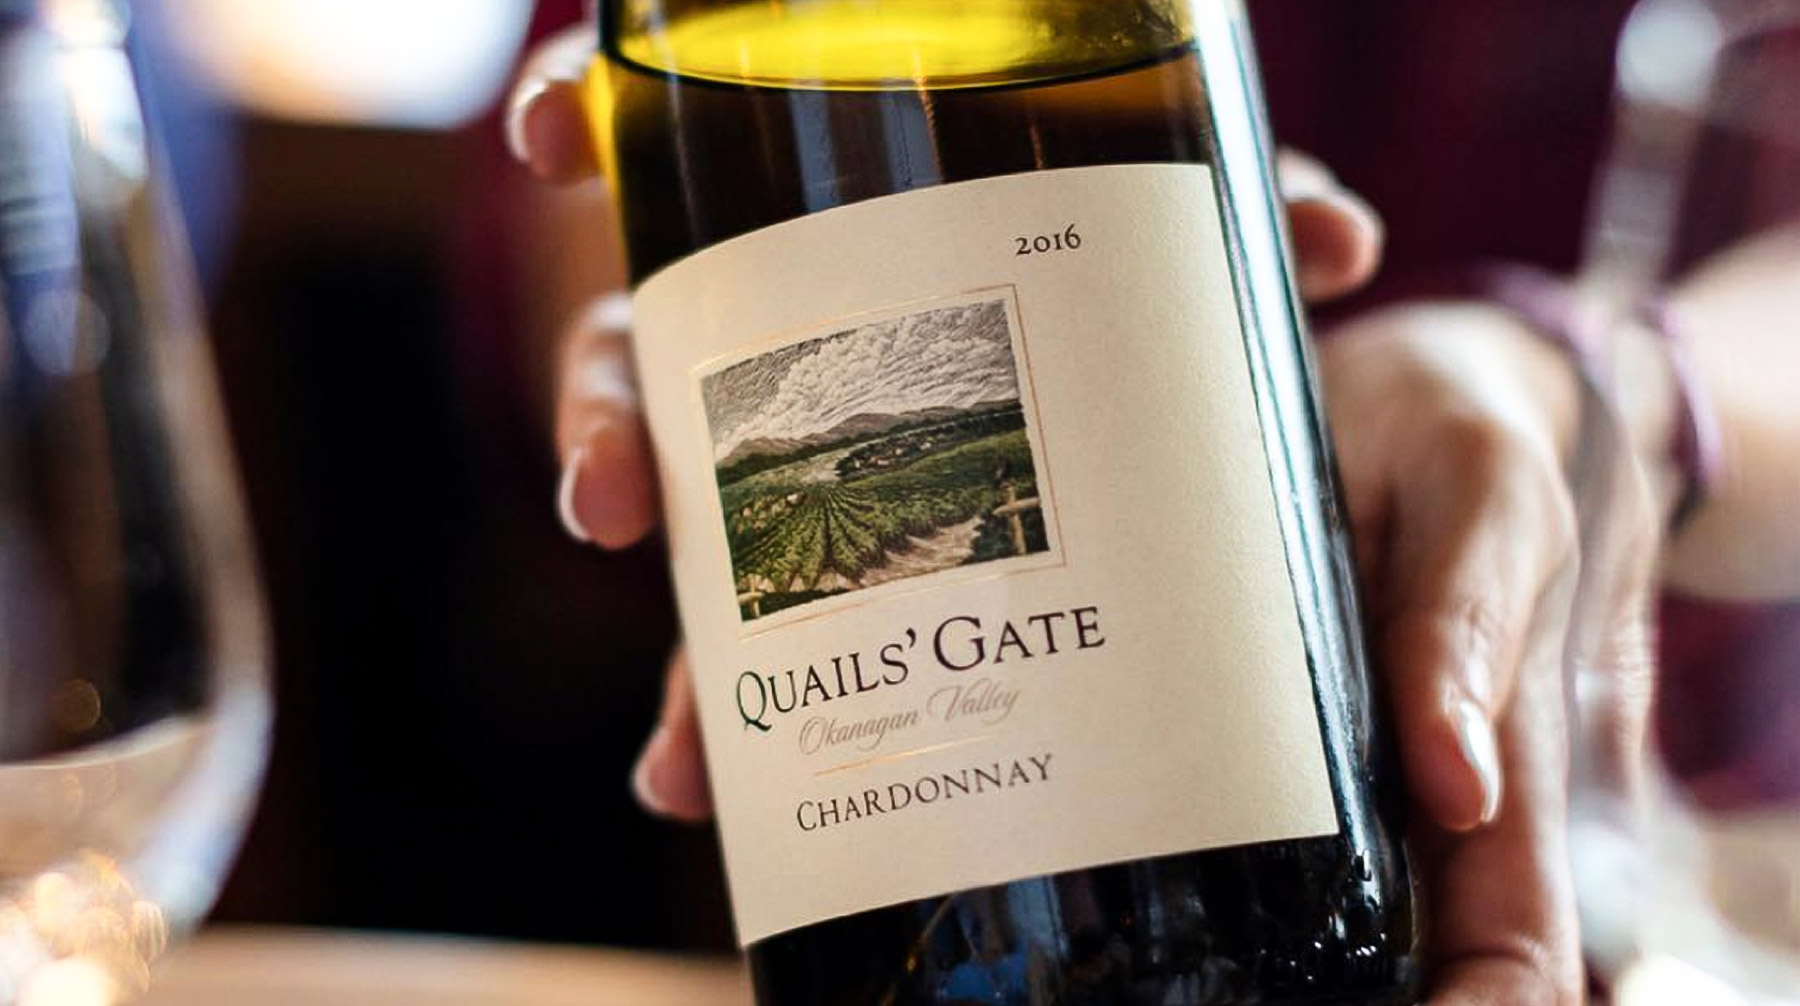 Quails' Gate Chardonnay.